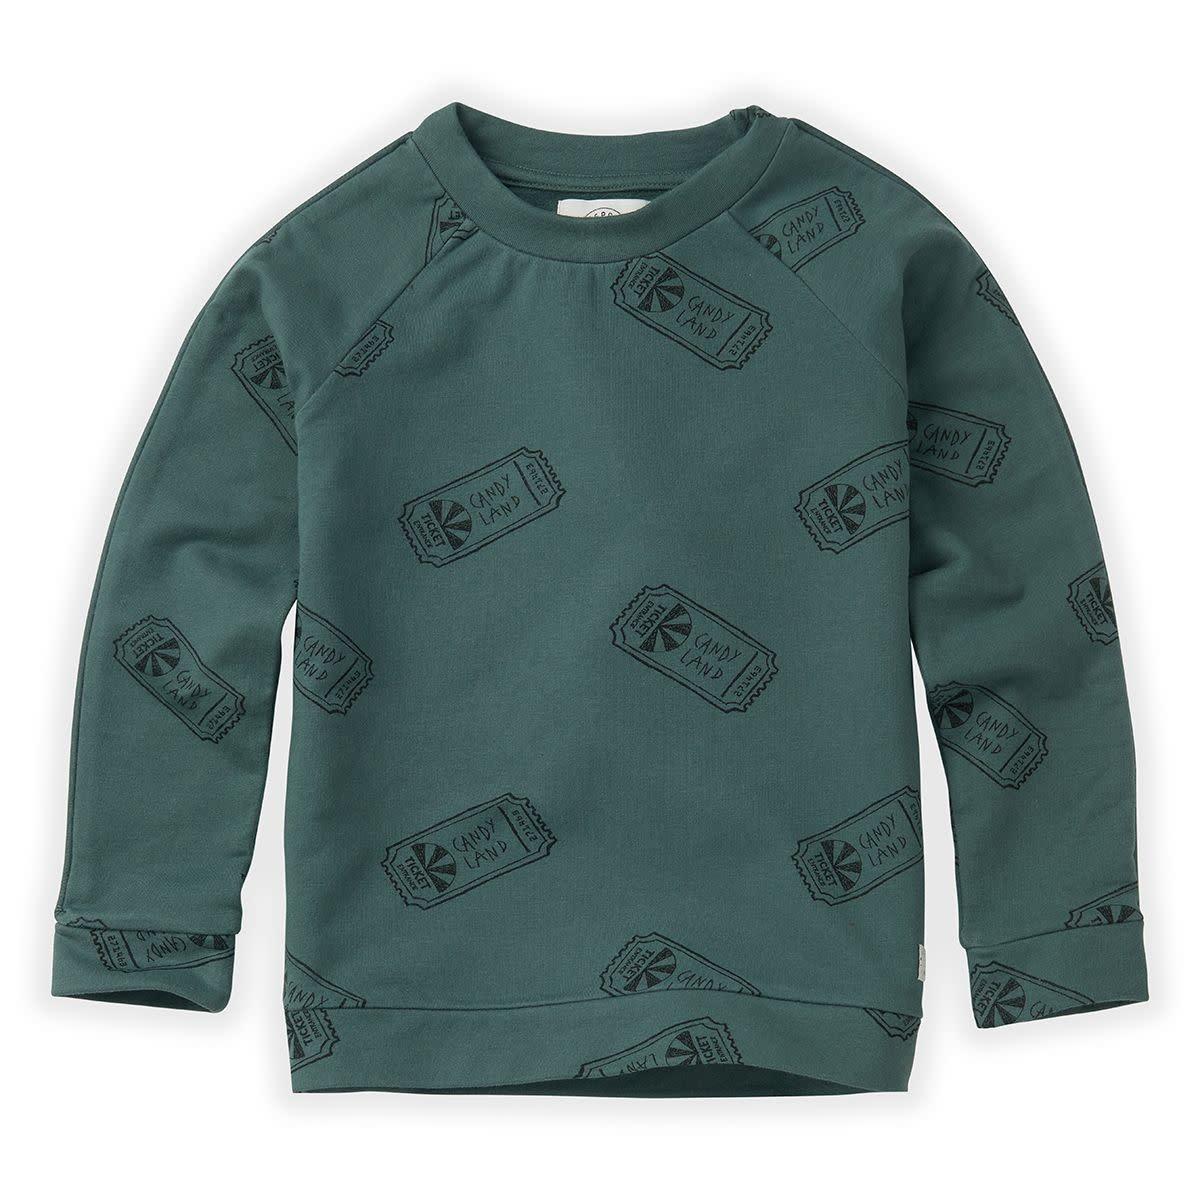 Sproet & Sprout Sproet&Sprout - Sweatshirt raglan ticket aop dusty green